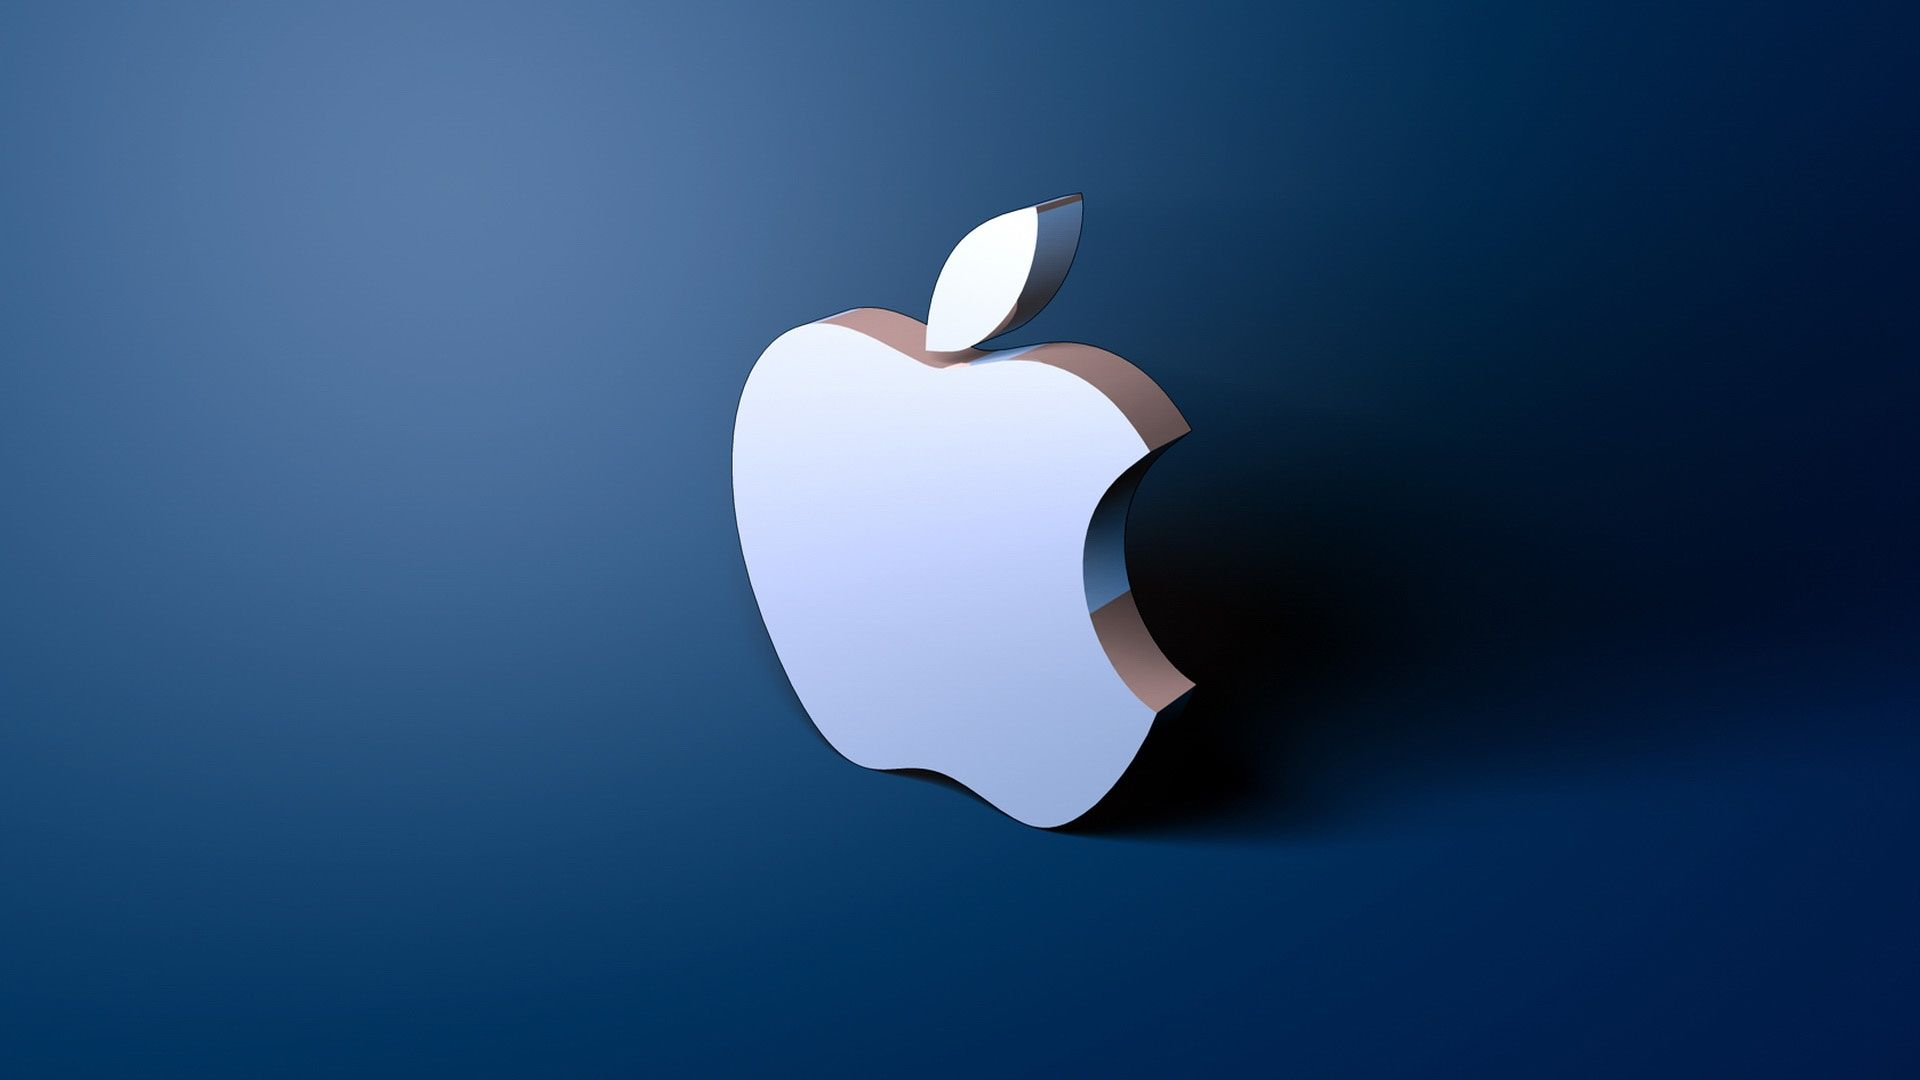 Hd wallpaper macbook - Download Apple Logo Design Flowers Pinterest Apple Logo Wallpaper And Apple Wallpaper